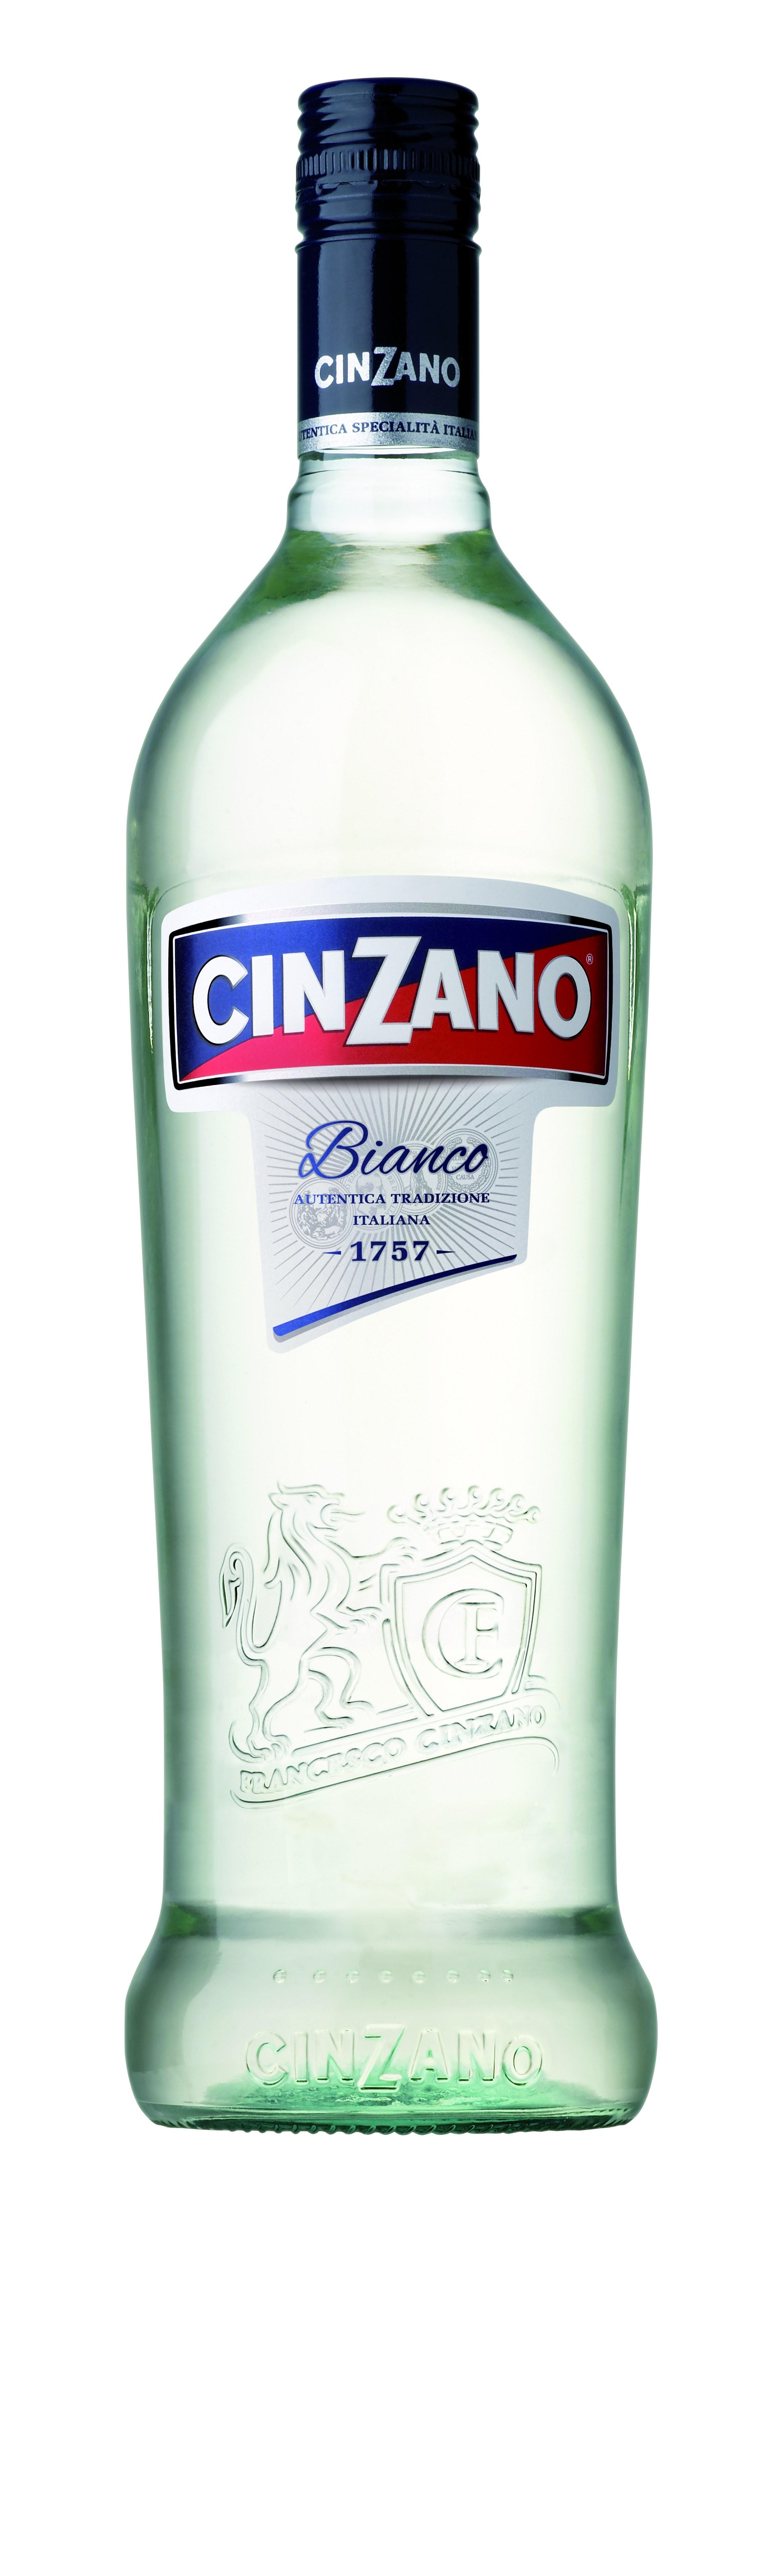 Cinzano Bianco